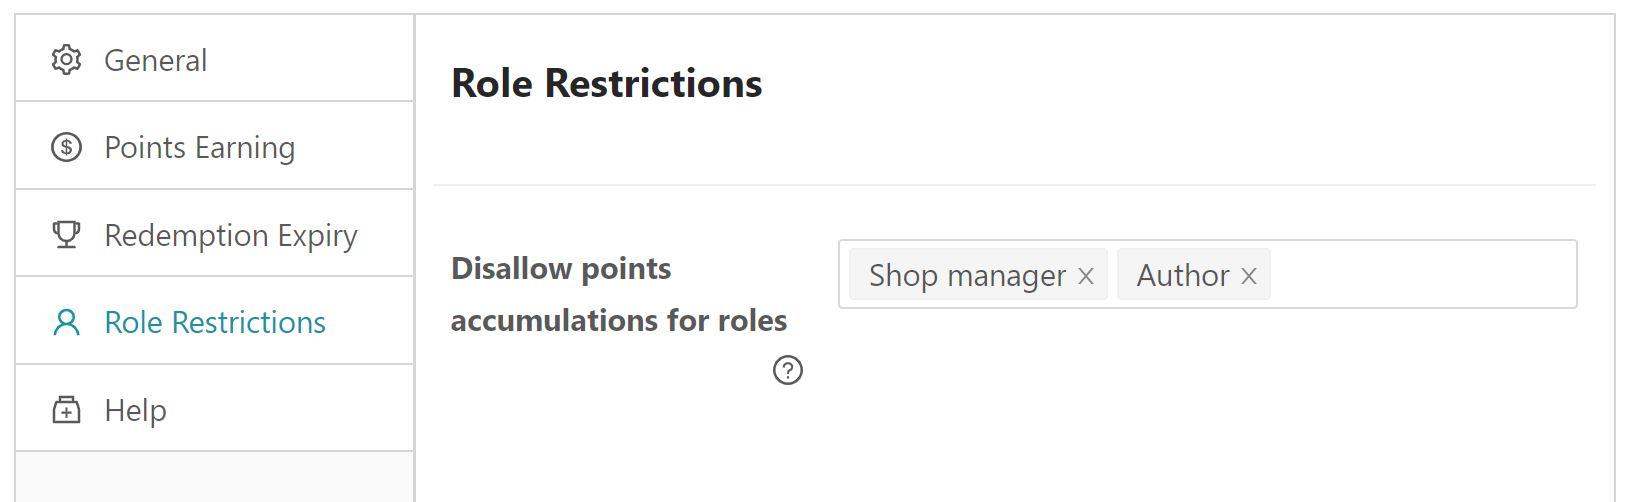 Set role restrictions for reward points.